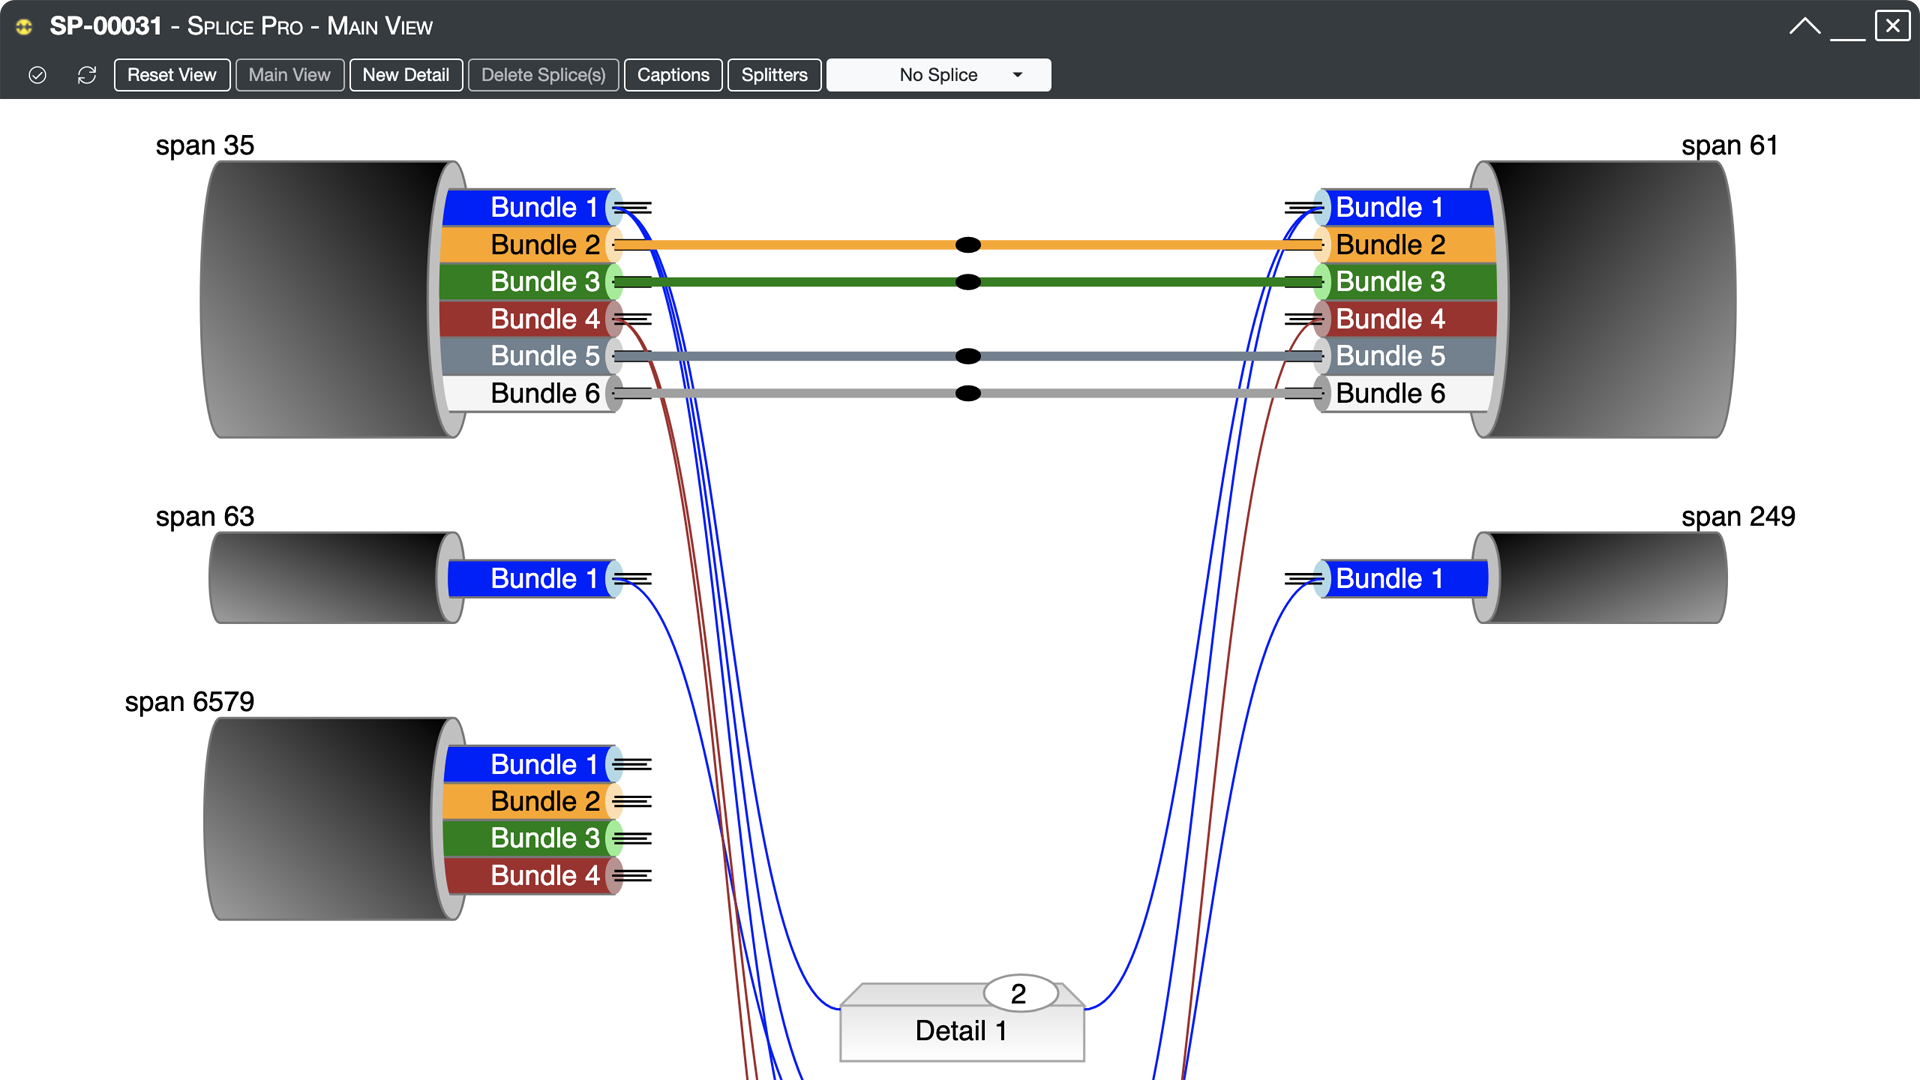 OSPInsight Web - Splice Pro (Window)